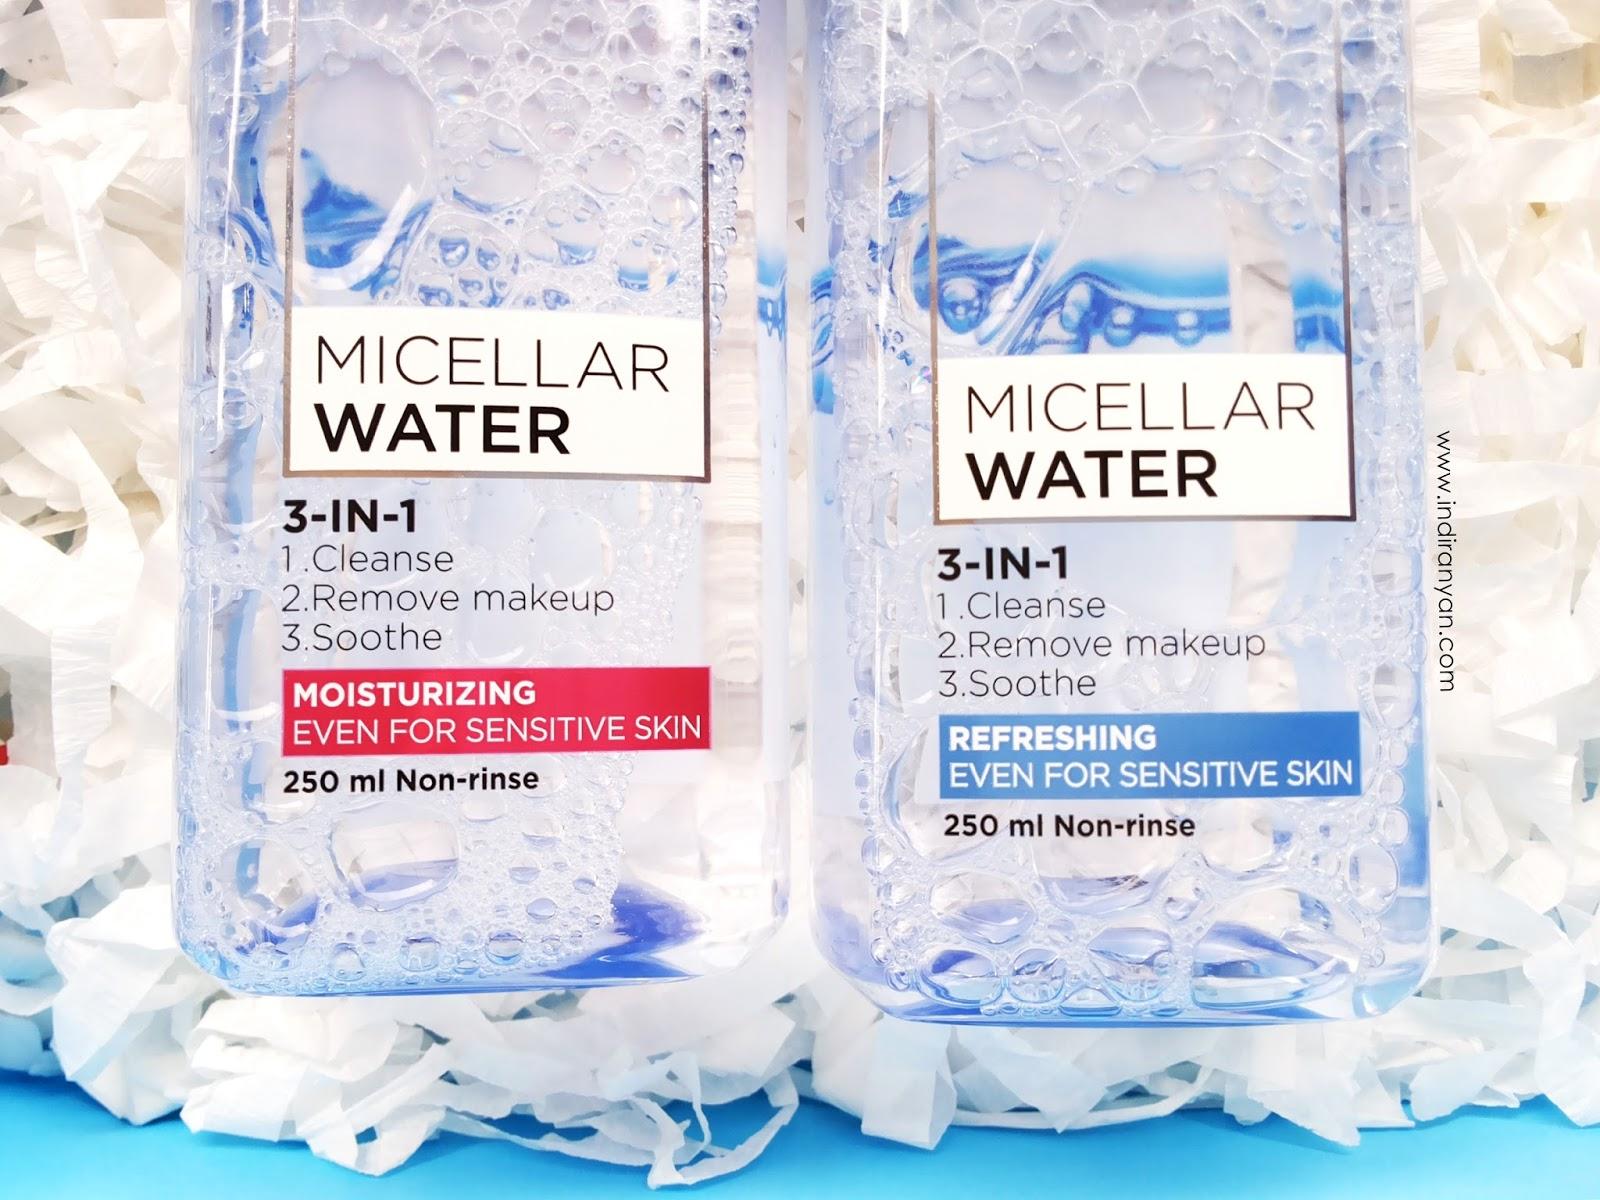 loreal-micellar-water-review, loreal-micellar-water-packaging, loreal-micellar-water-harga,  loreal-micellar-water-variant